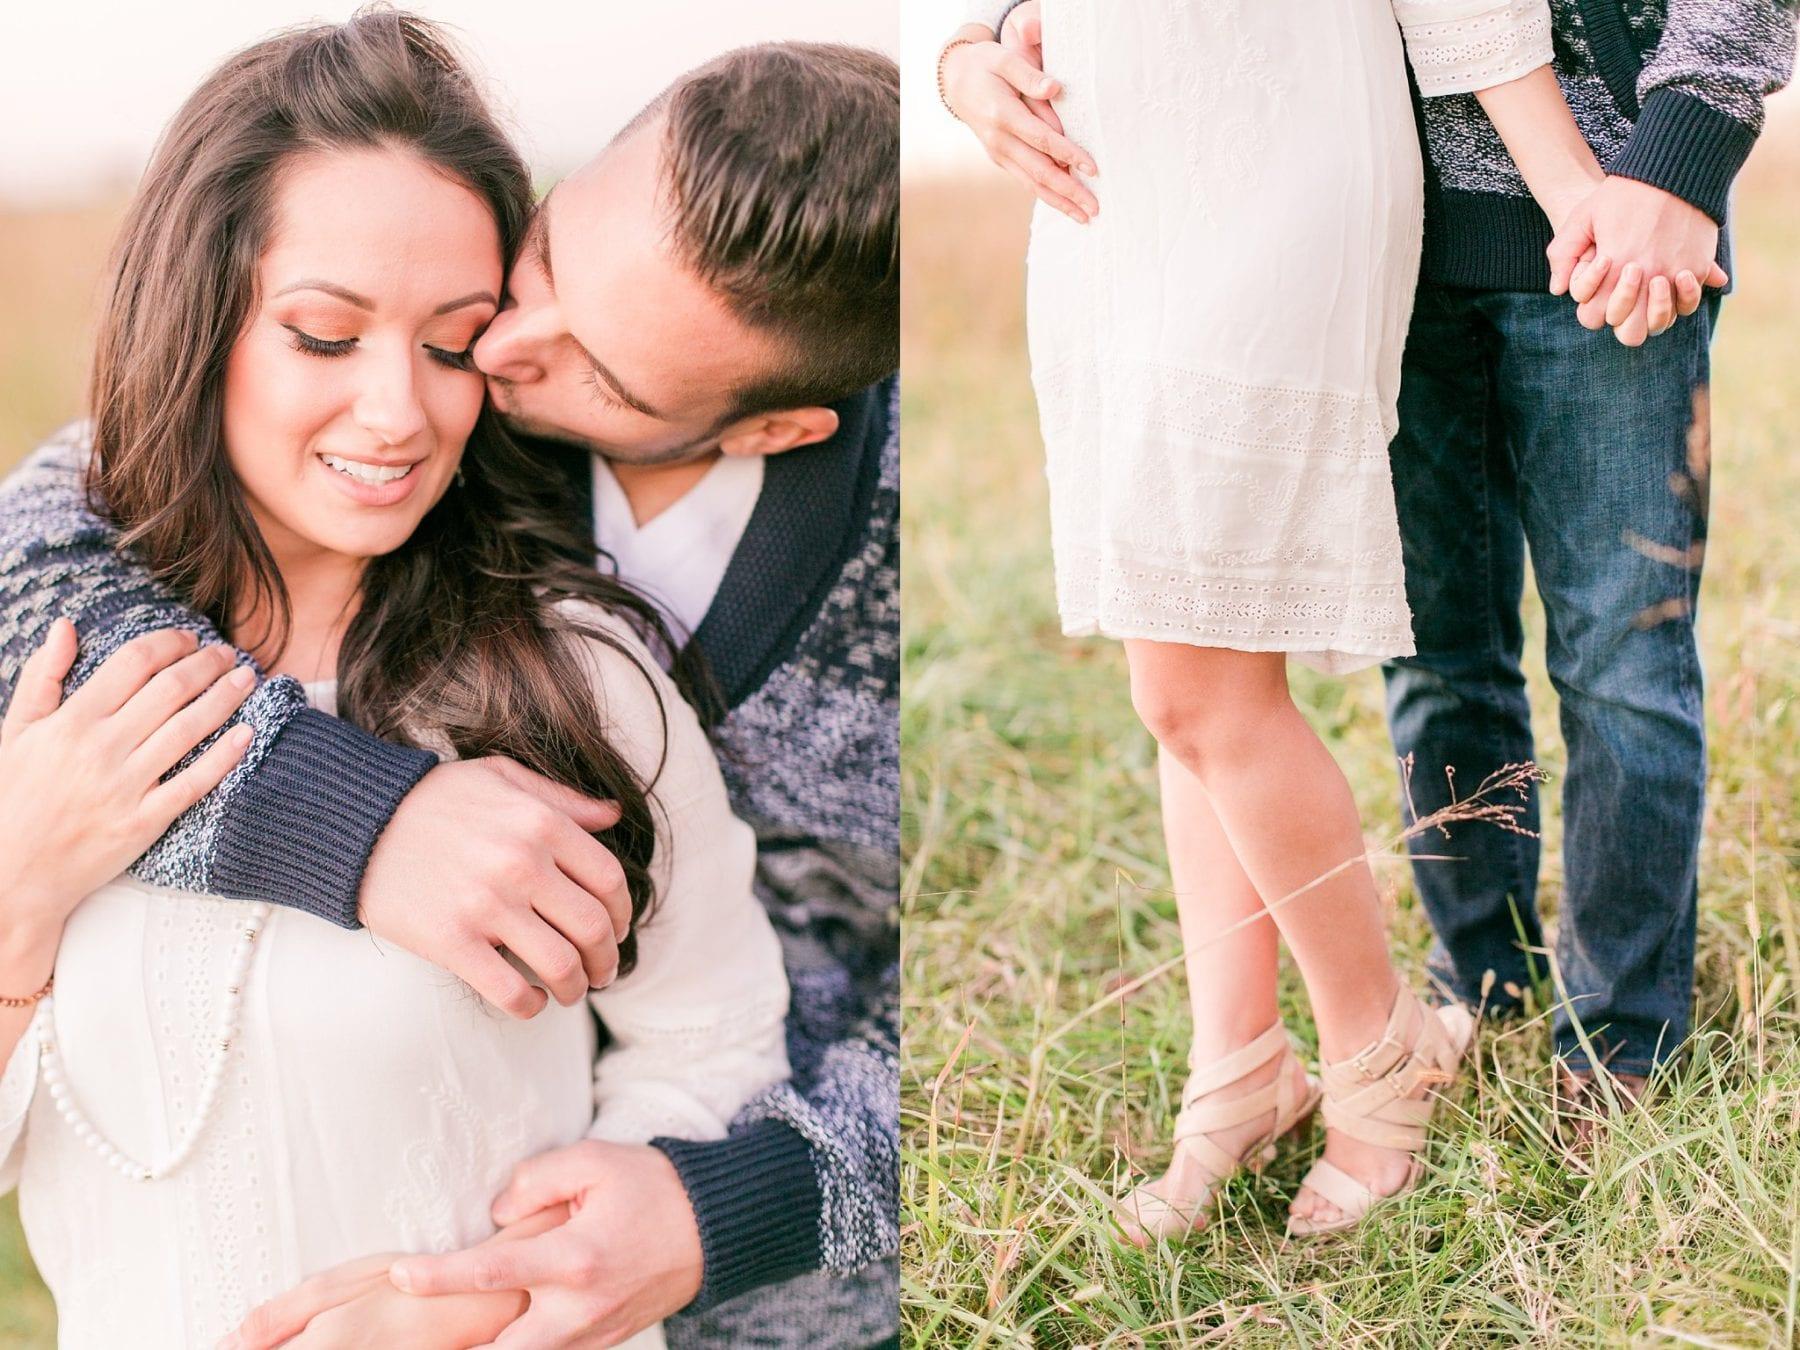 Manassas Battlefield Portraits Virginia Wedding Photographer Megan Kelsey Photography Lianne & Chris-301.jpg